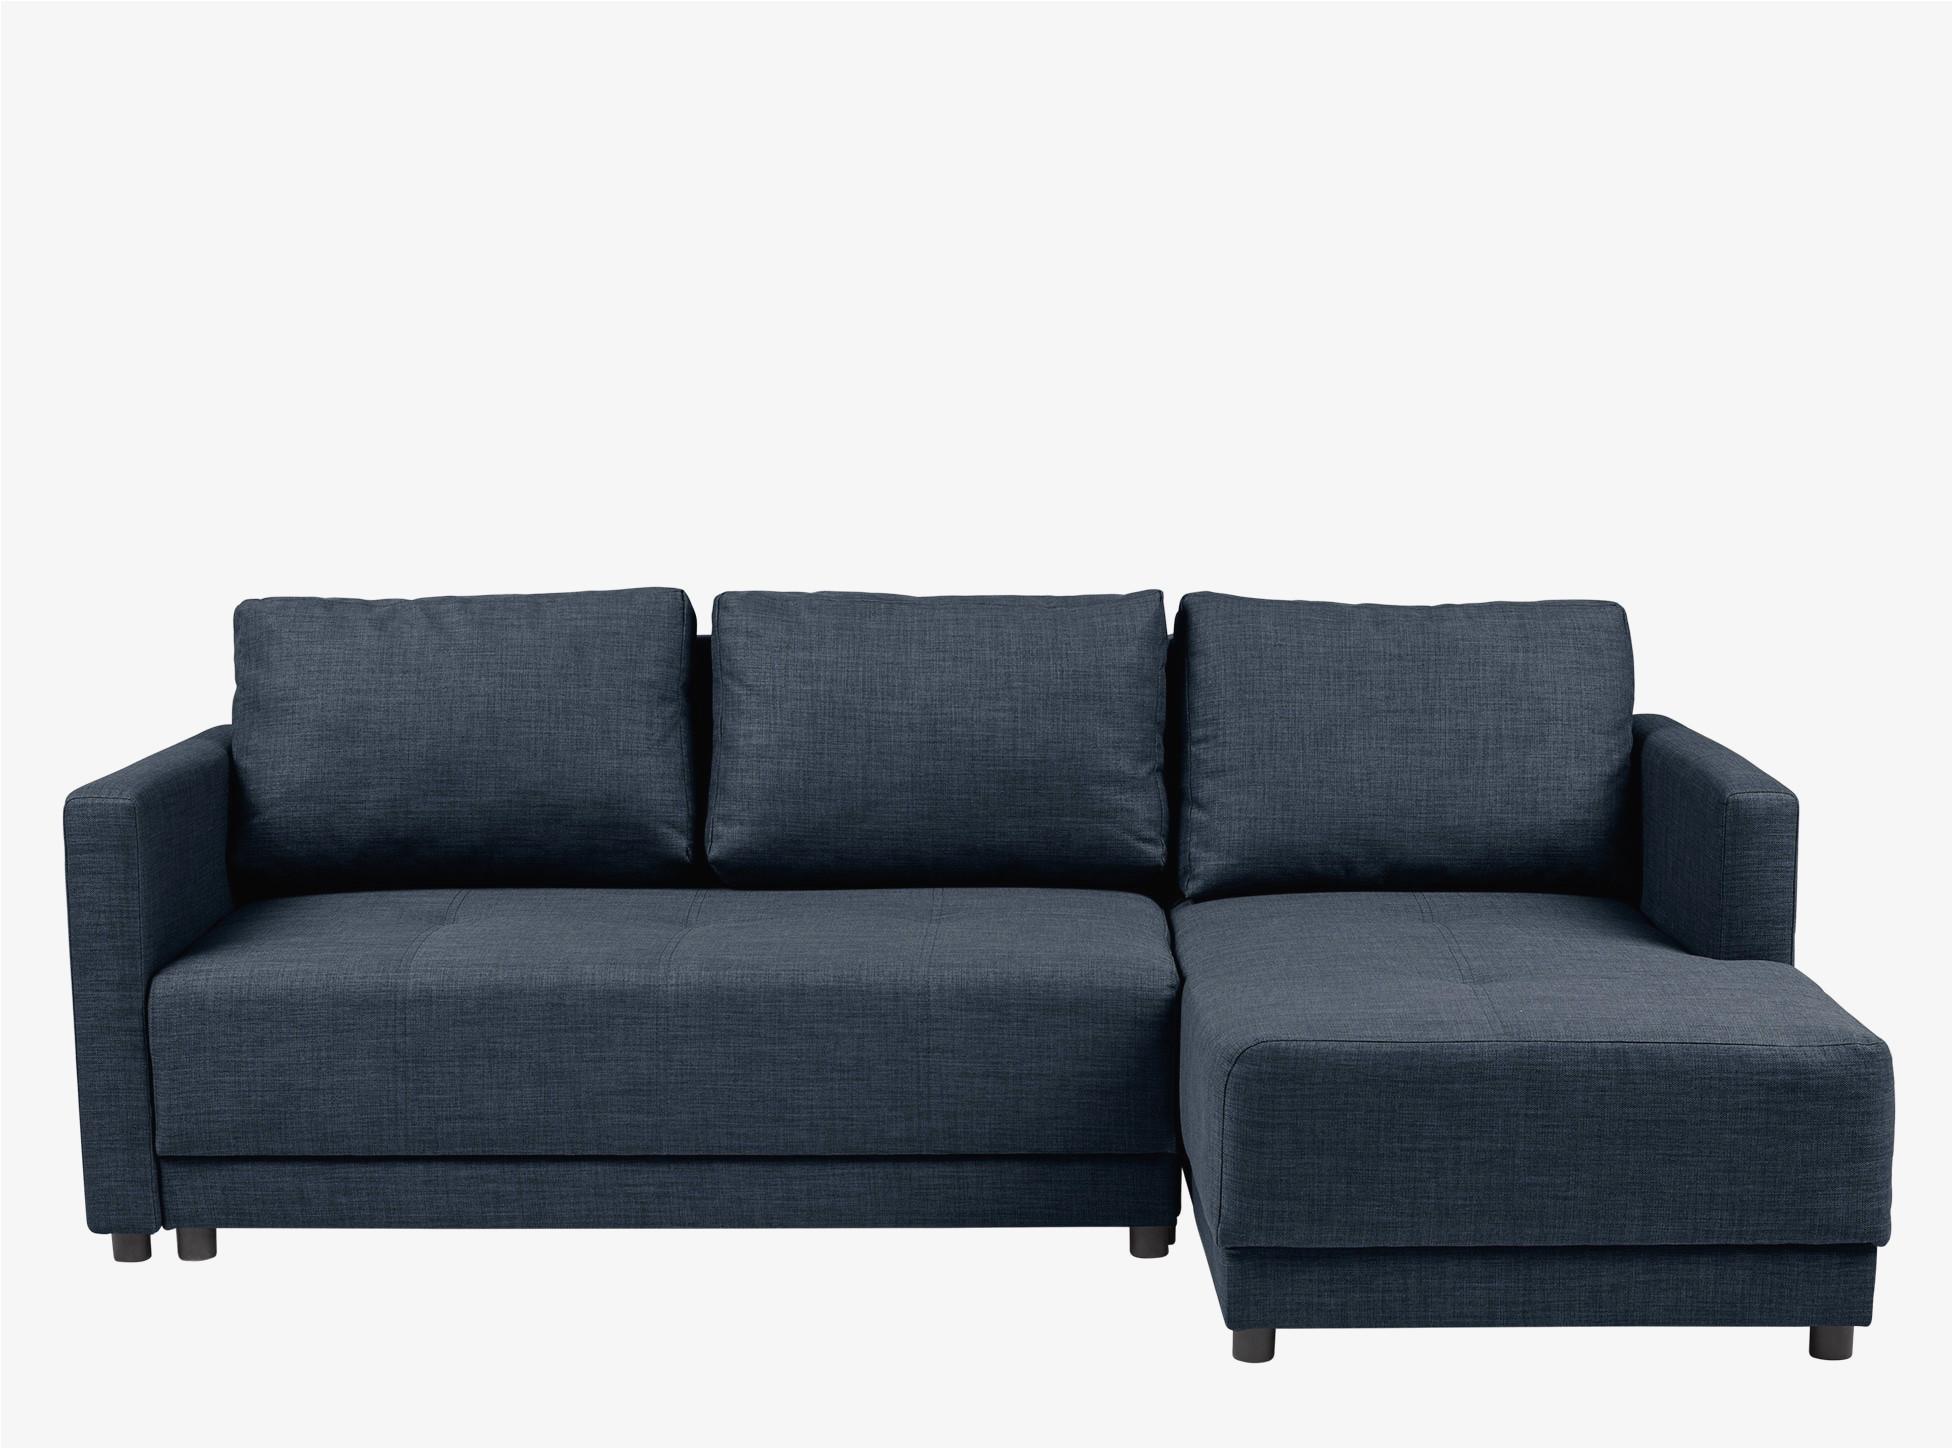 amazing ikea friheten sofa bed review interior decorating ideas best classy simple and home design